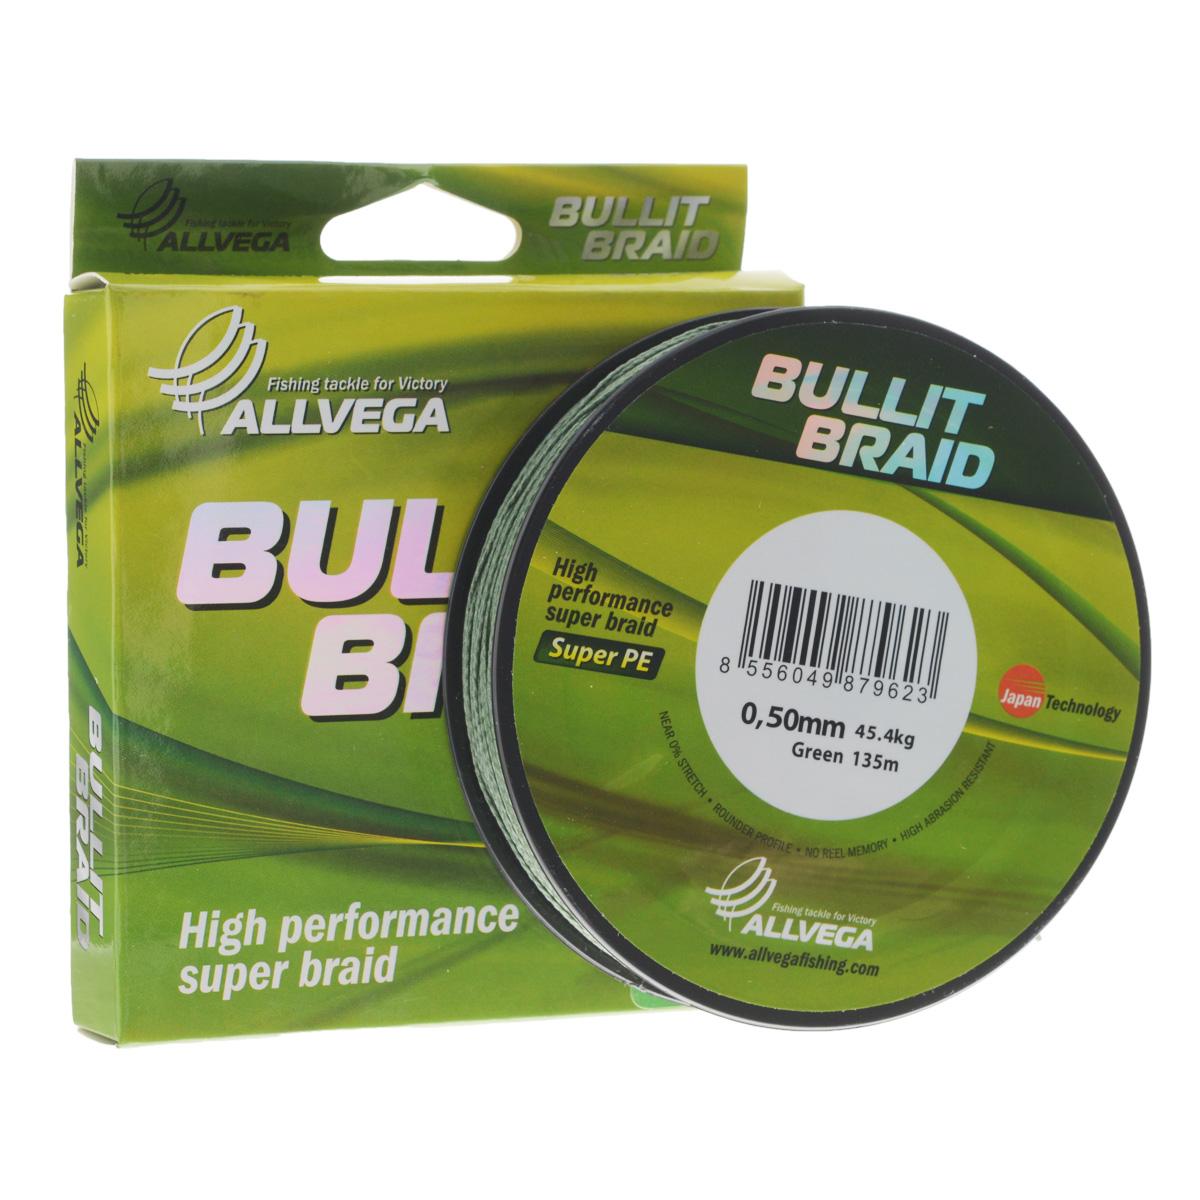 "Леска плетеная Allvega ""Bullit Braid"", цвет: темно-зеленый, 135 м, 0,50 мм, 45,4 кг 32047"